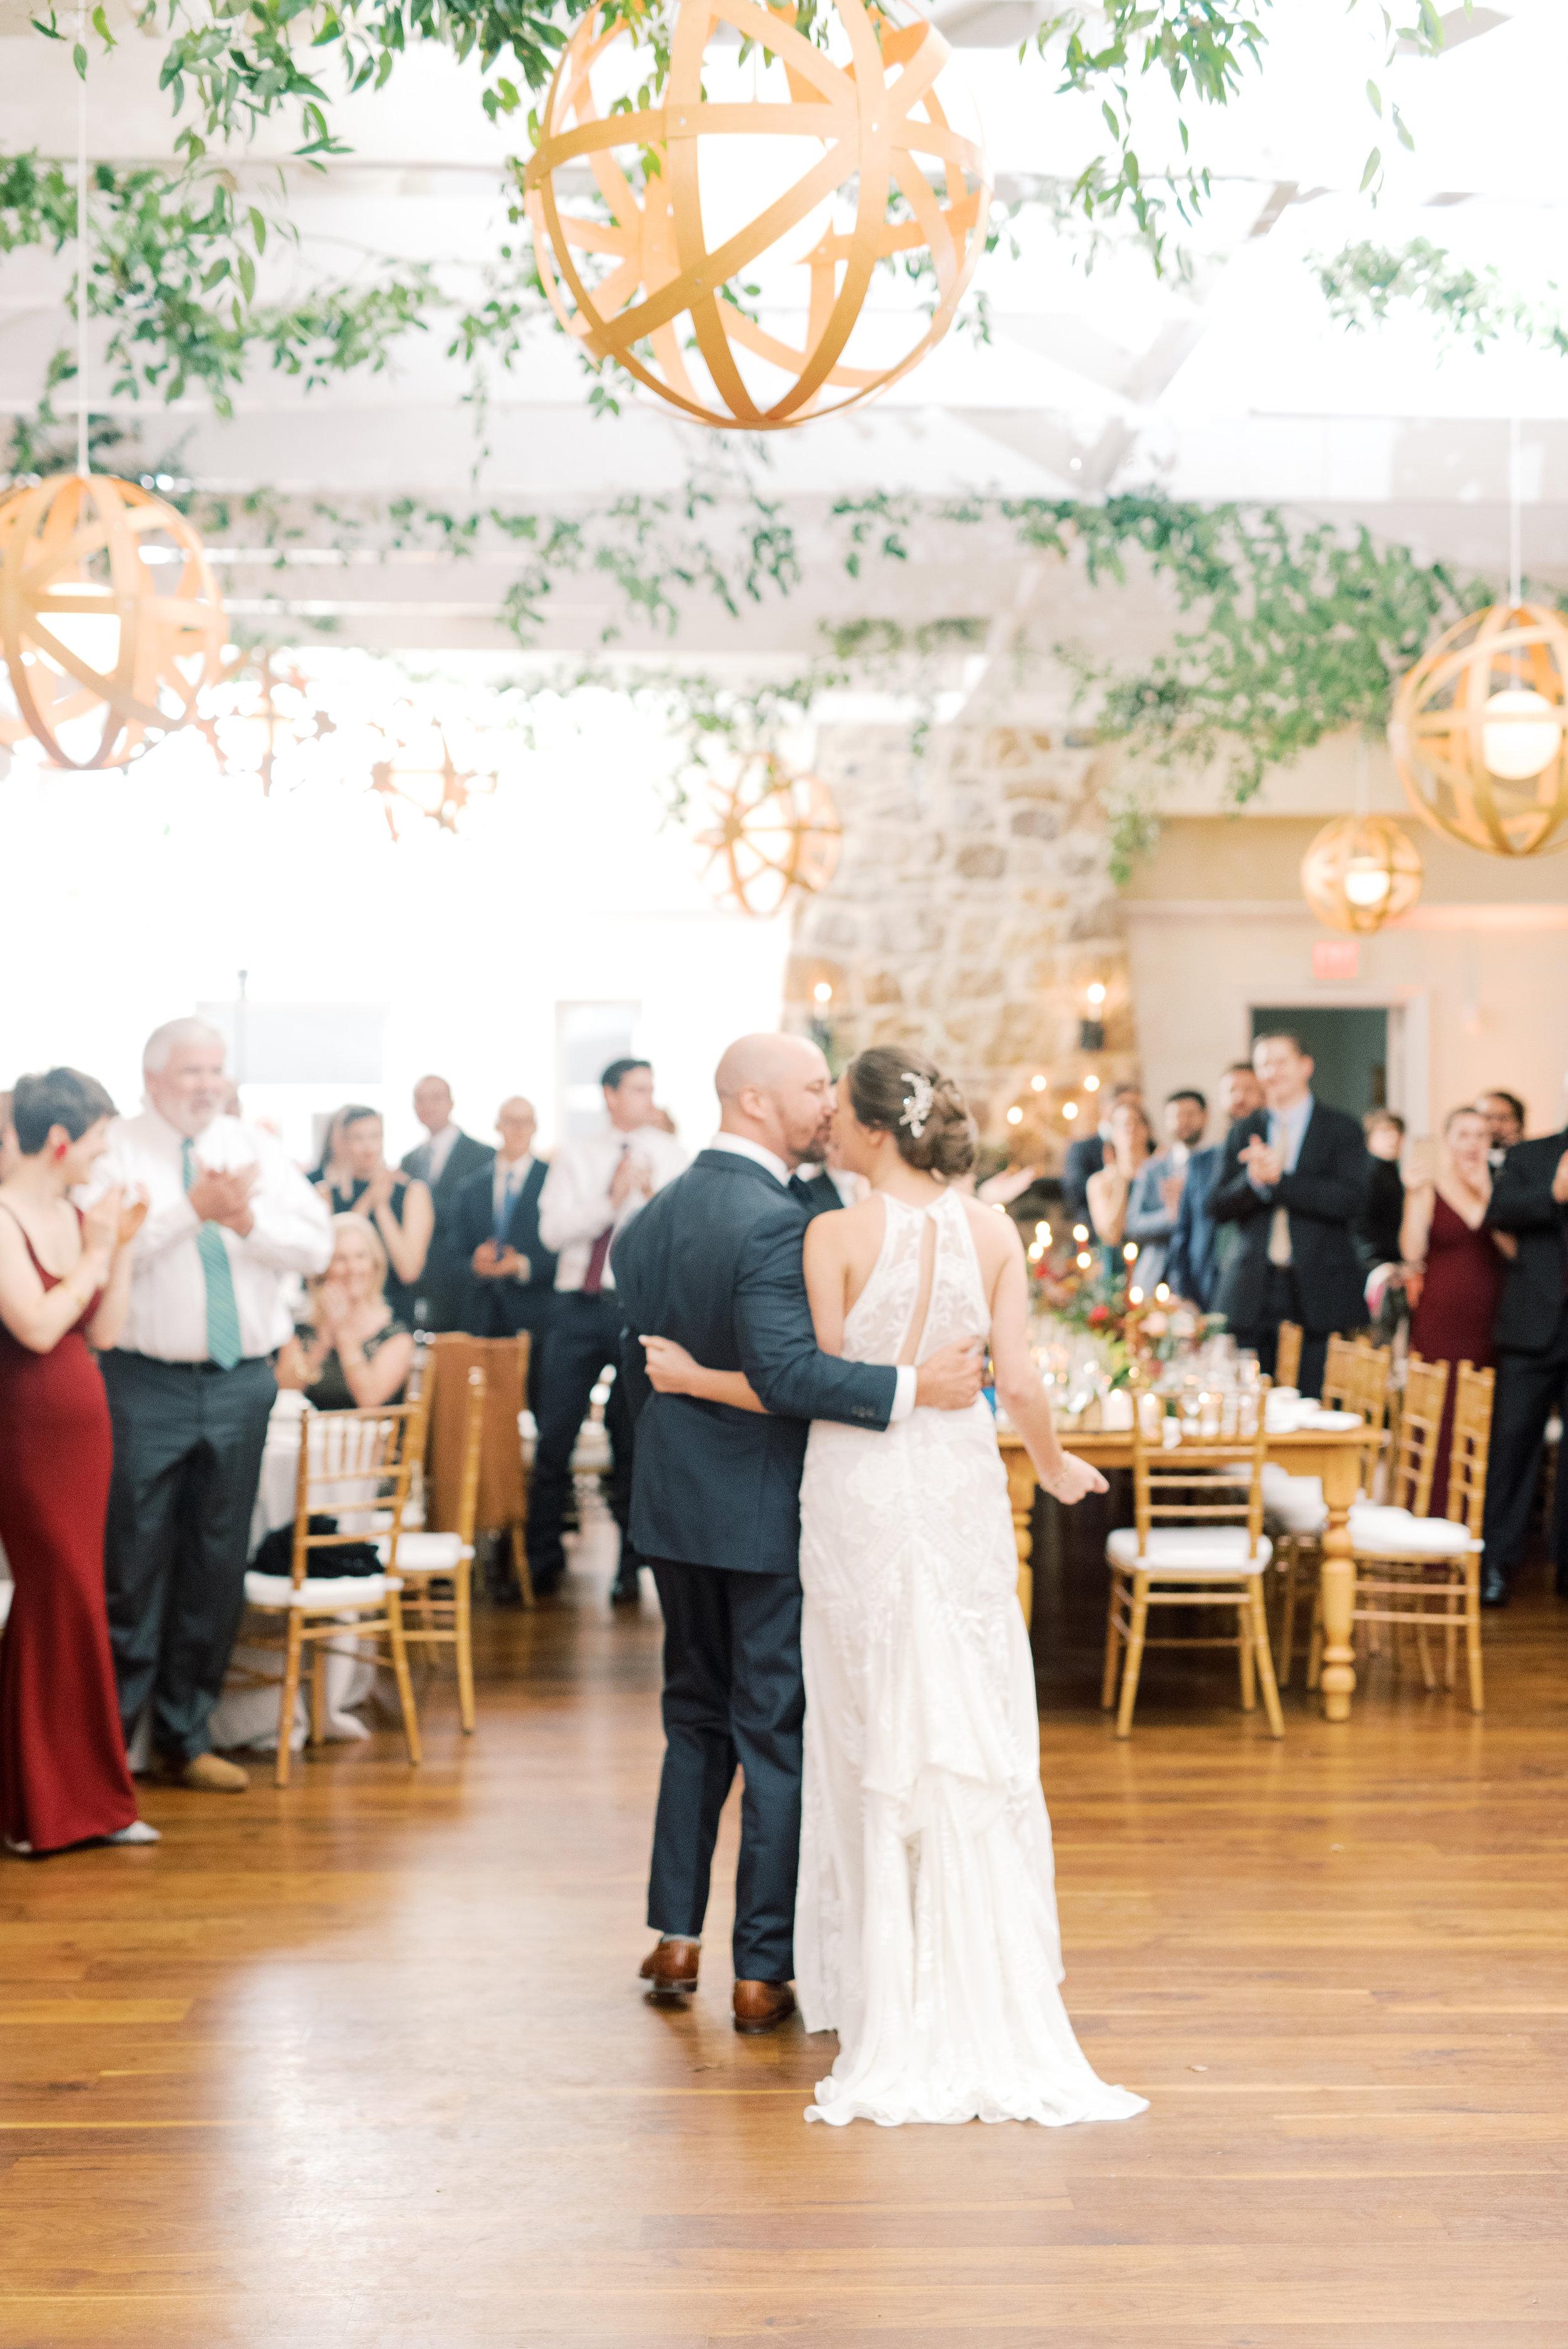 haley-richter-photography-october-pomme-wedding-in-radnor-100.jpg